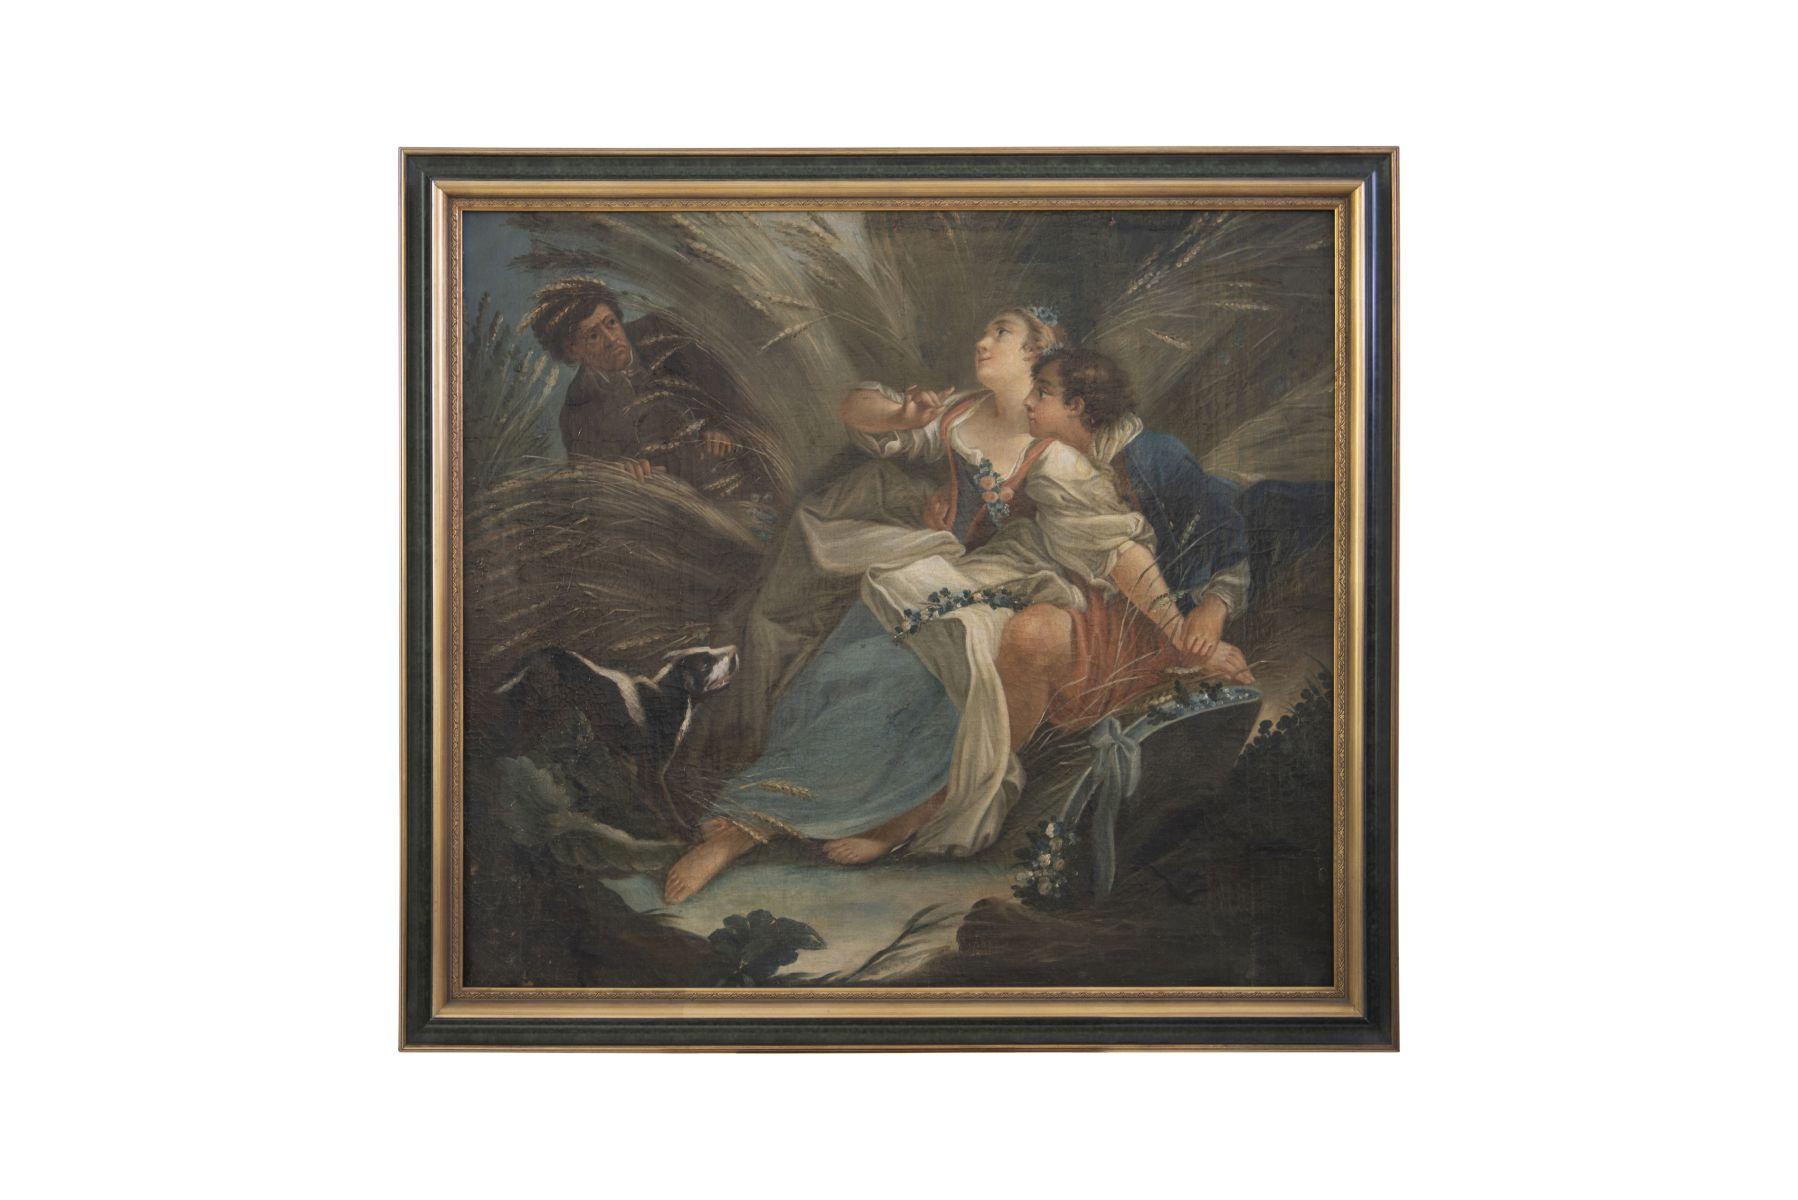 "#23 France 18th century ""Caught lovers"" | Frankreich 18. Jahrhundert ""Ertapptes Liebespaar"" Image"